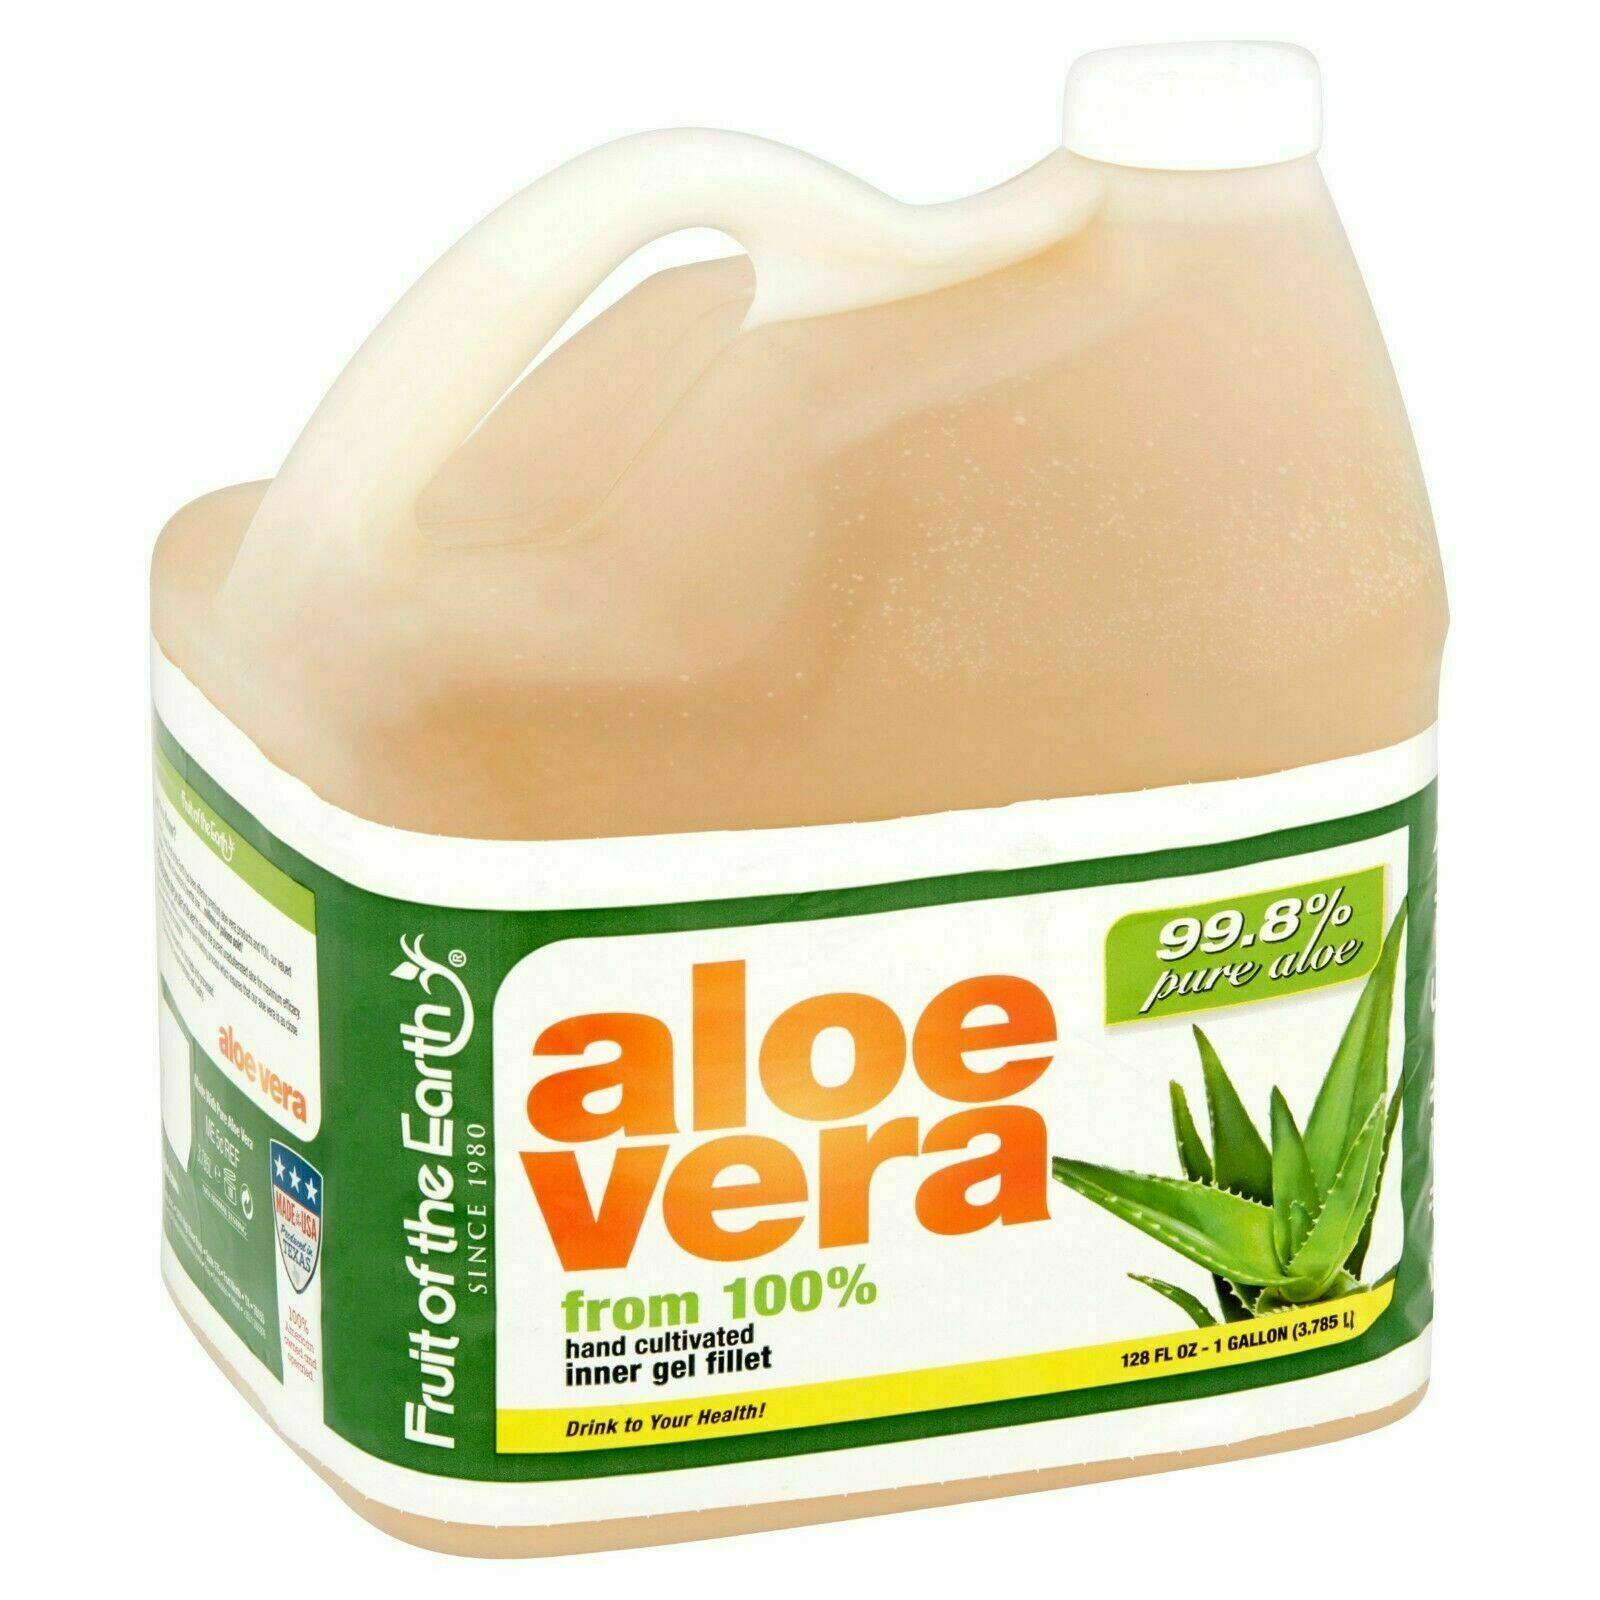 1 Gallon Organic Aloe Vera 100% Hand Cultivated Inner Fillet